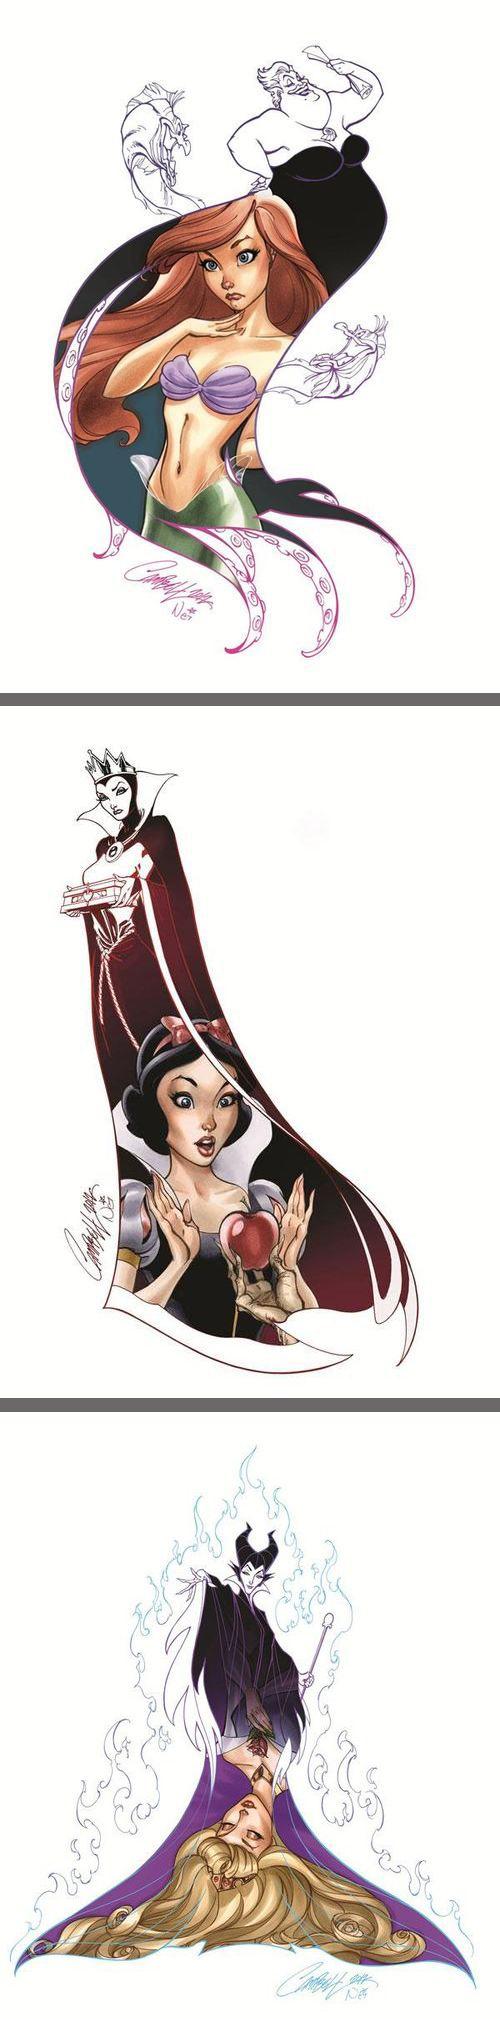 Disney Art, Heroines & Villains (by J. Scott Campbell and Nei Ruffino)